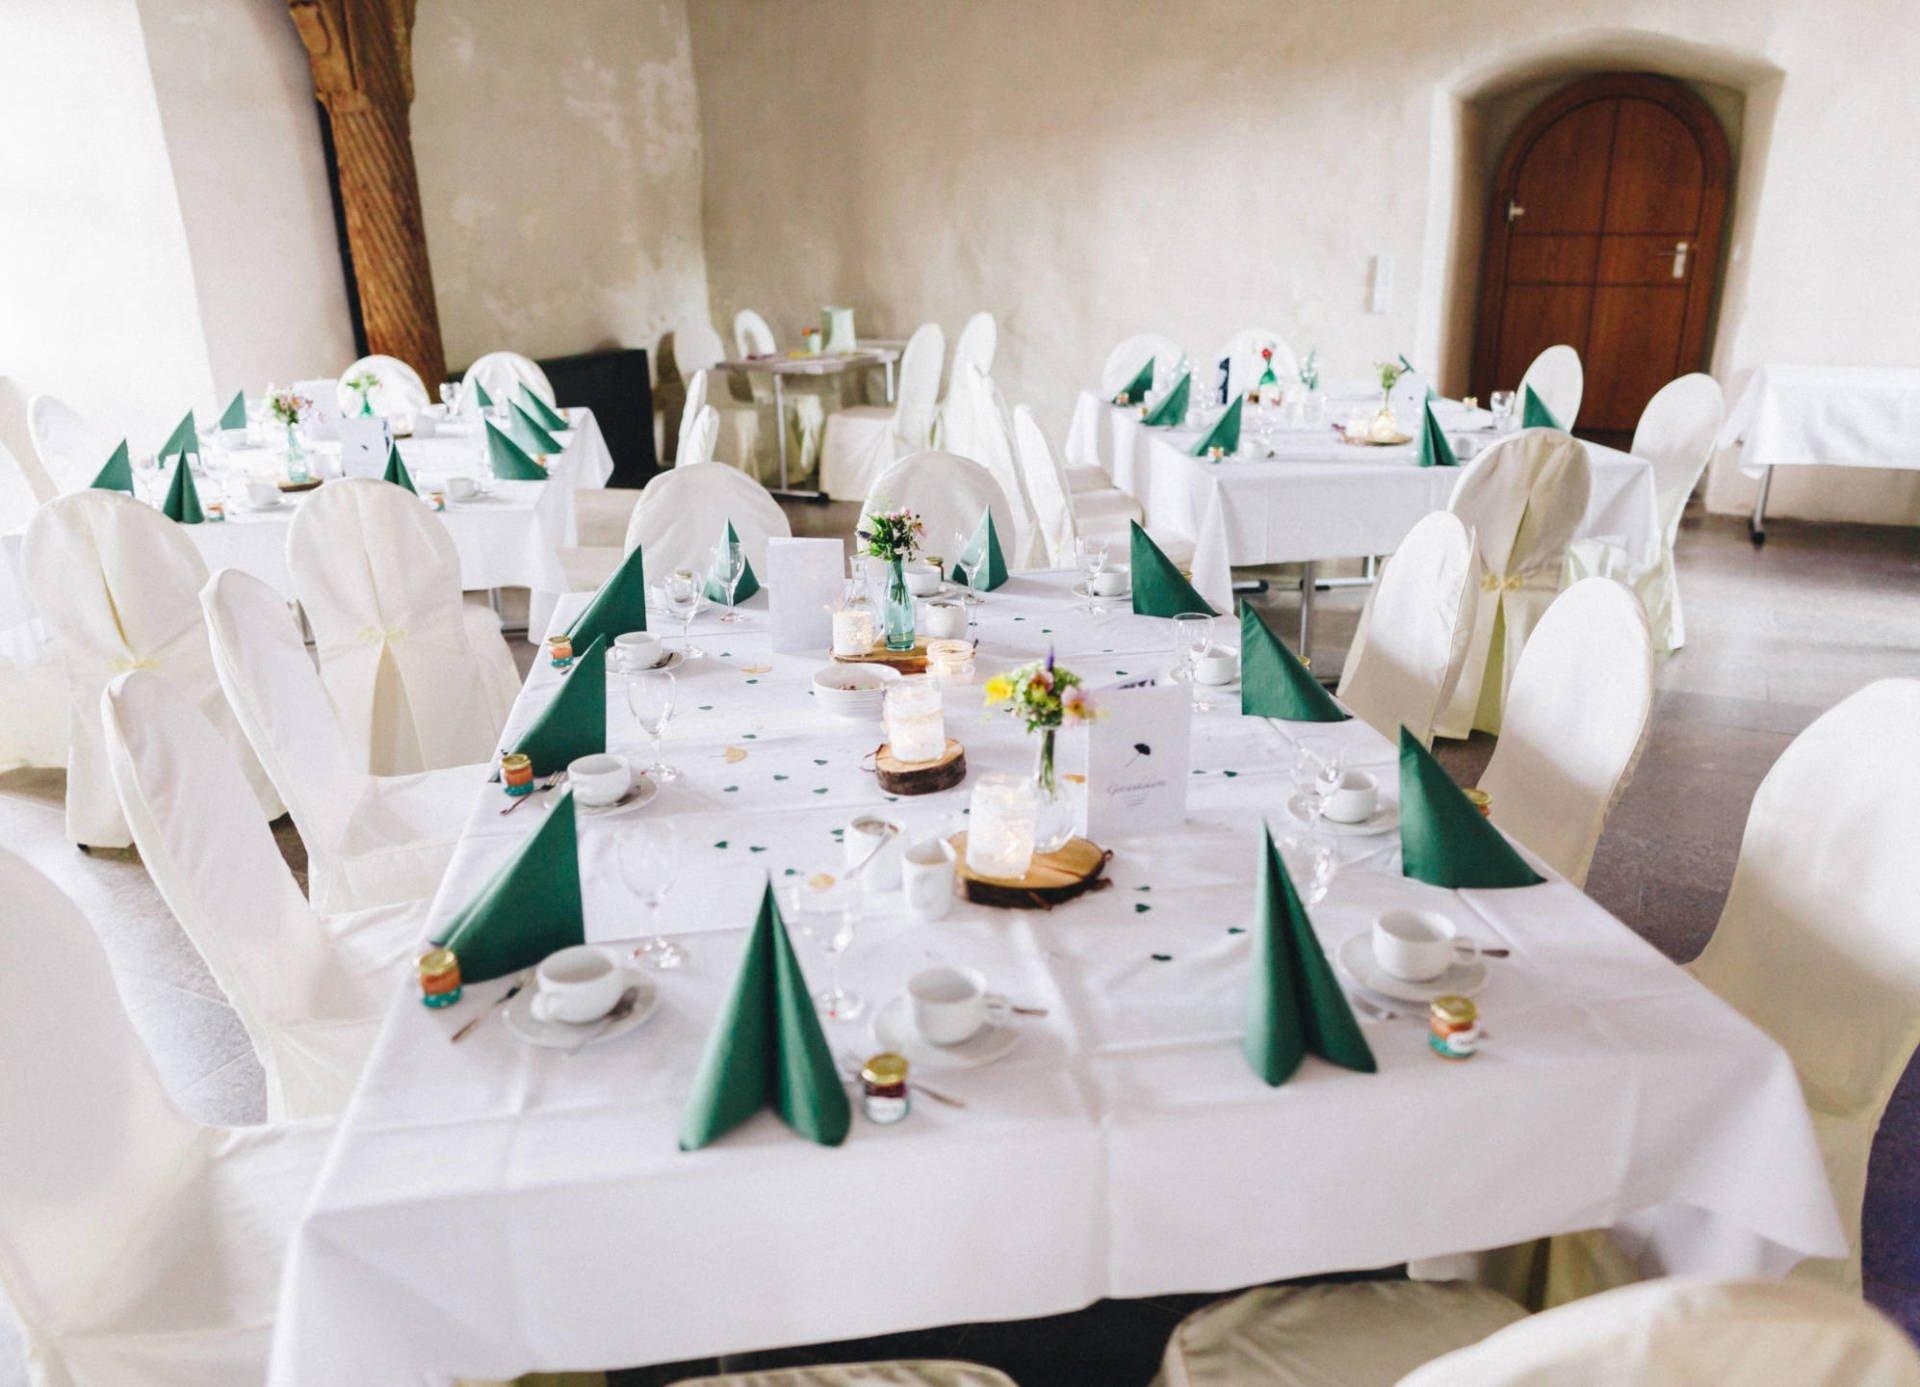 JuleSascha 22 1920x1387 - Hochzeit im alten Dornburger Schloss